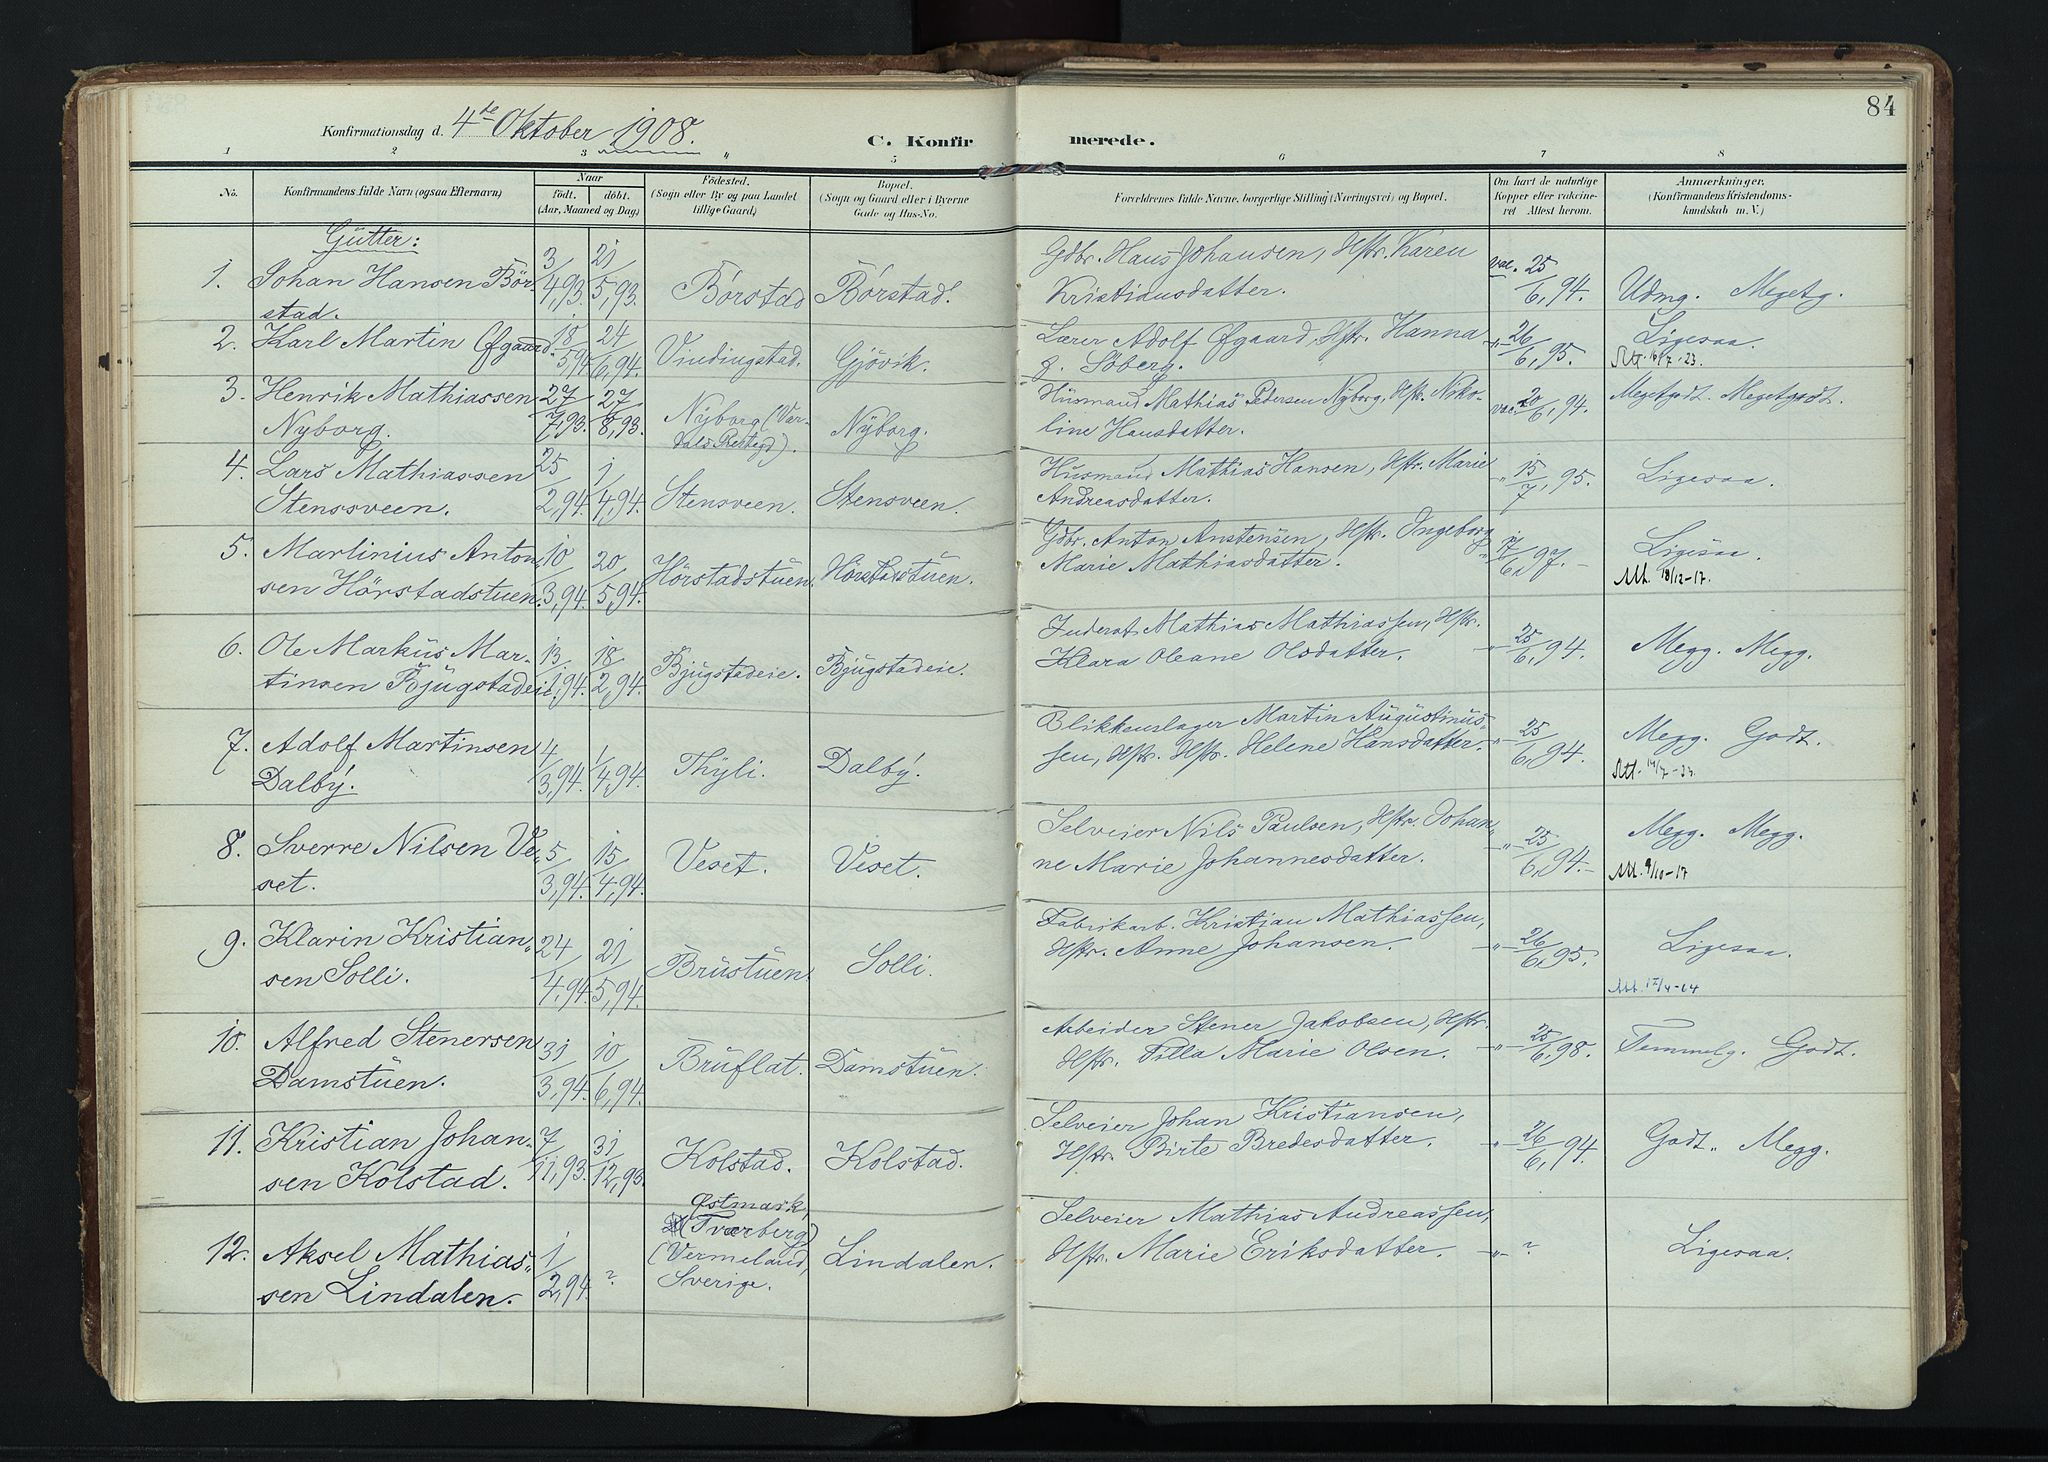 SAH, Vardal prestekontor, H/Ha/Haa/L0020: Ministerialbok nr. 20, 1907-1921, s. 84